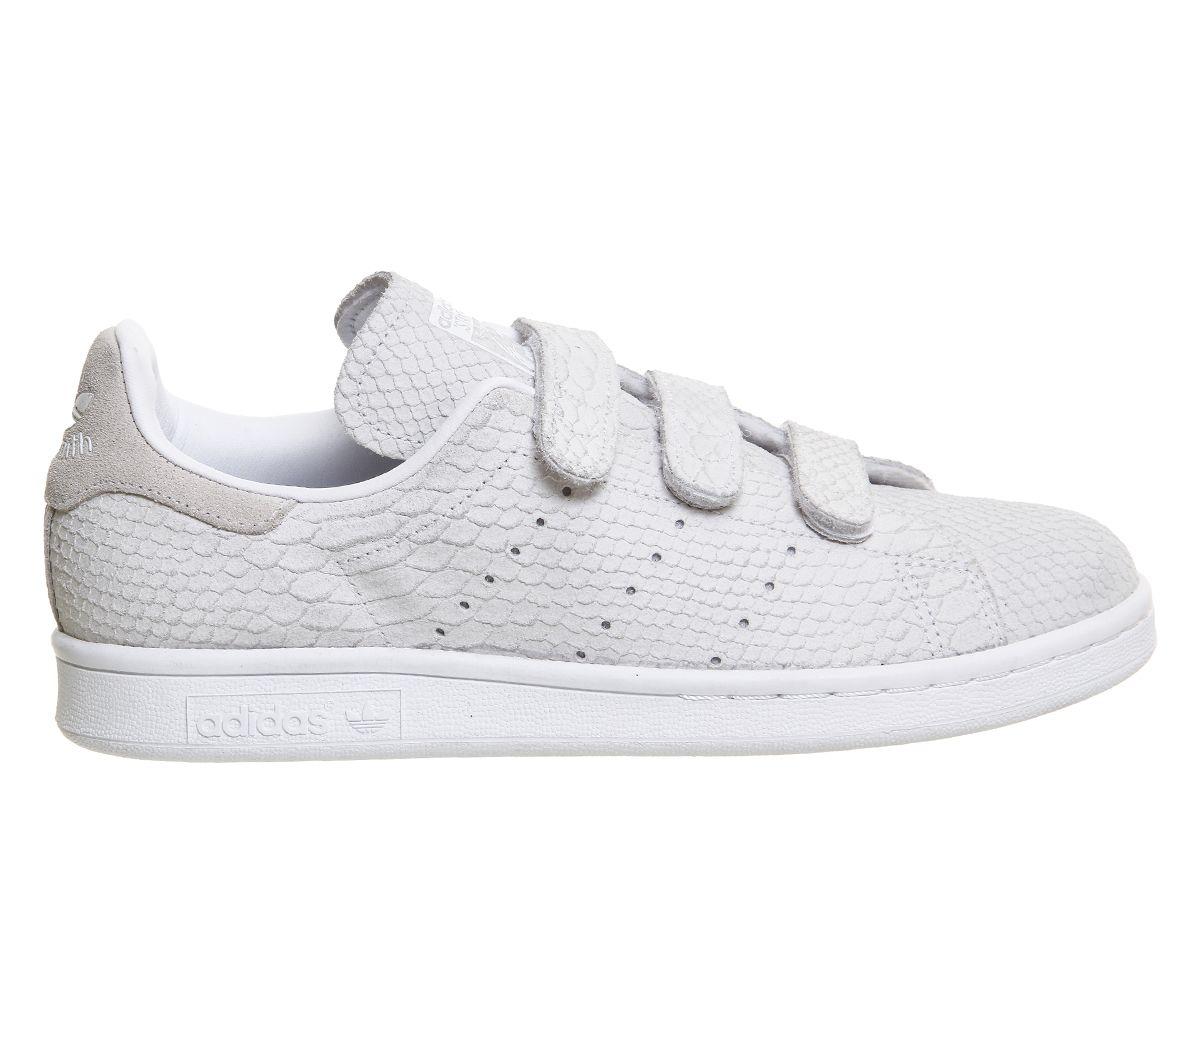 Adidas Stan Smith Cf Trainers Triple White Unisex Sports